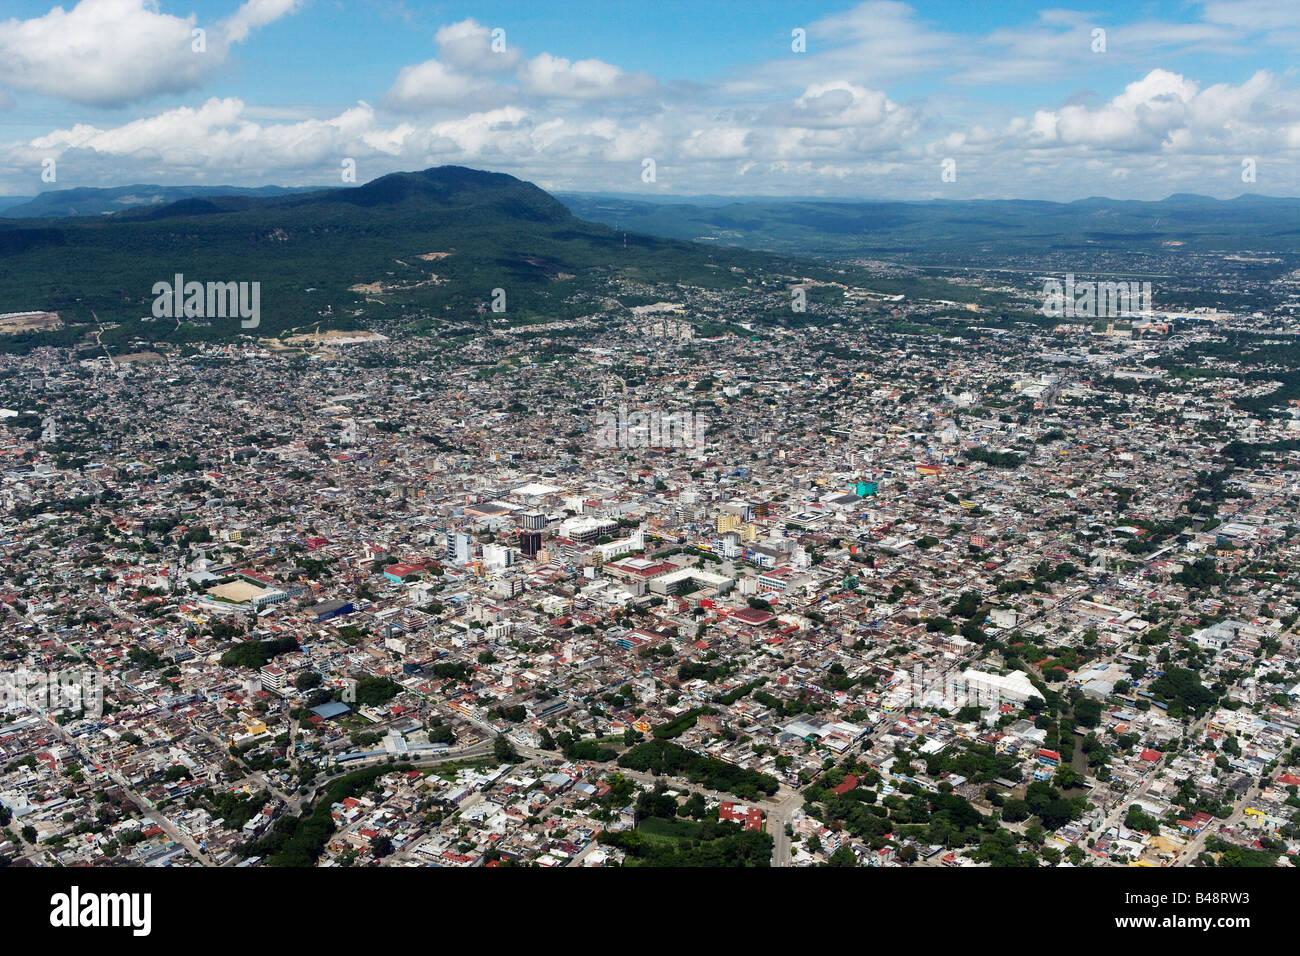 aerial above Tuxtla Gutierrez Chiapas Mexico - Stock Image